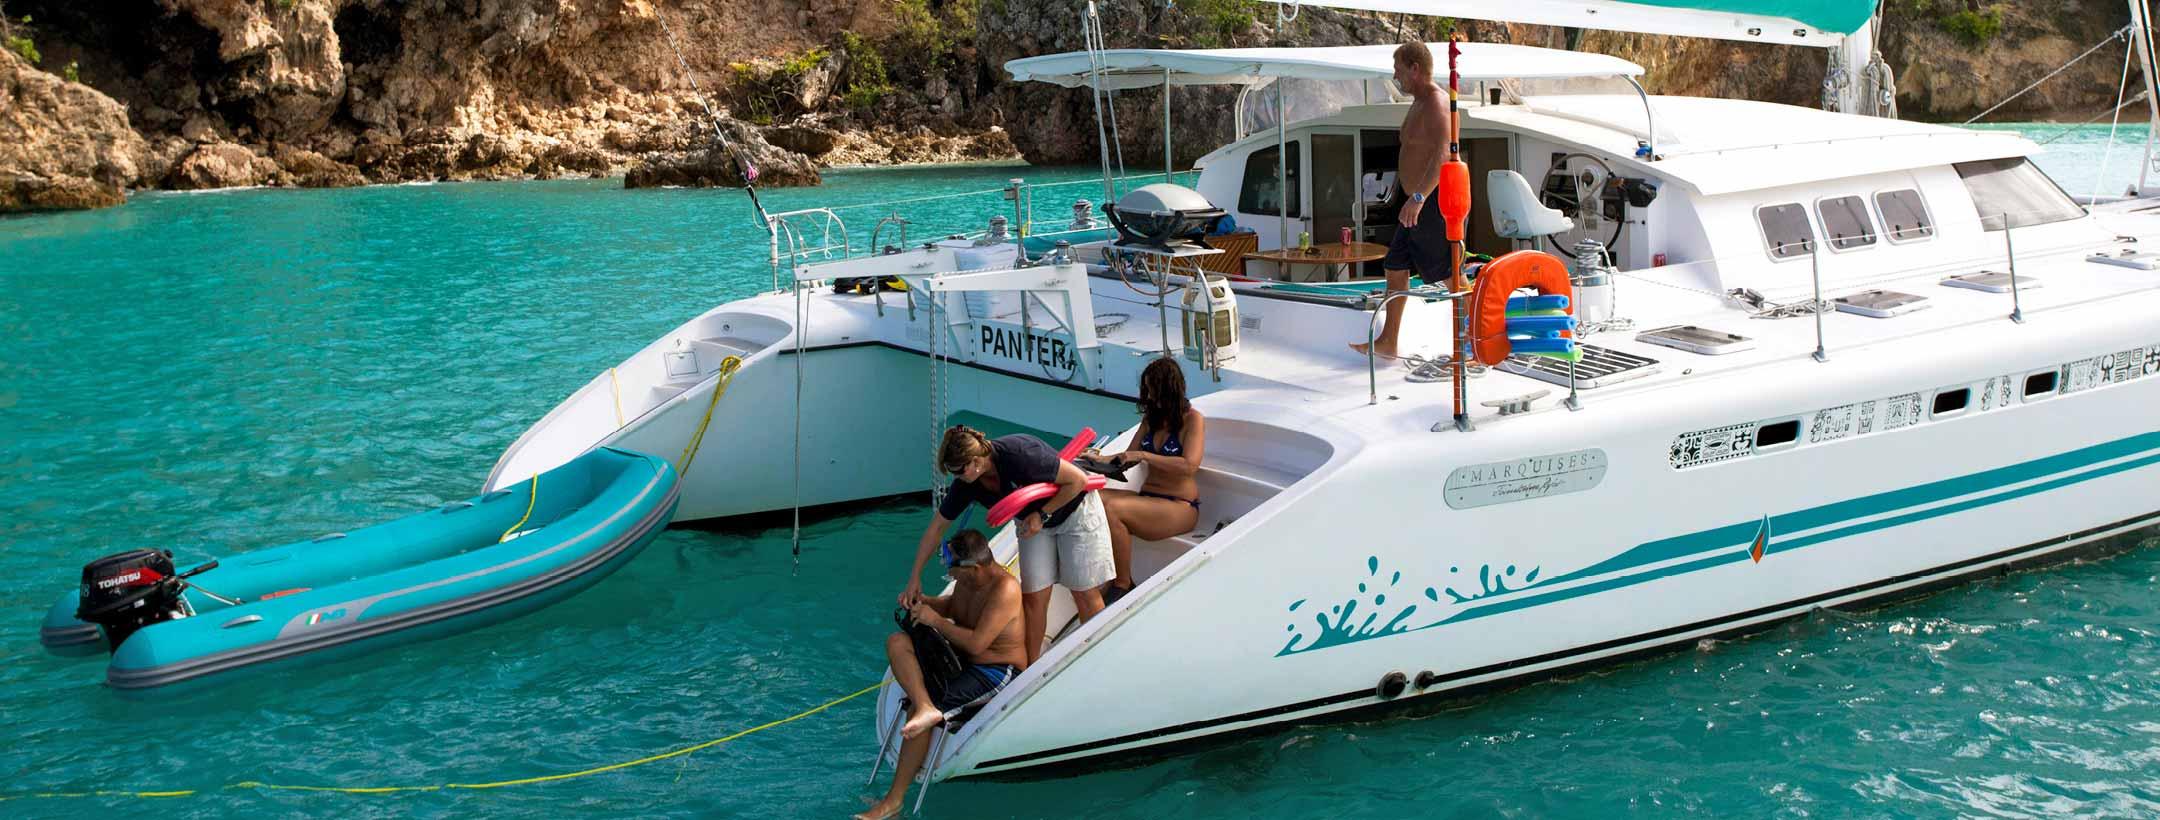 TradeWinds Marquises 56 Cruising Class Yacht